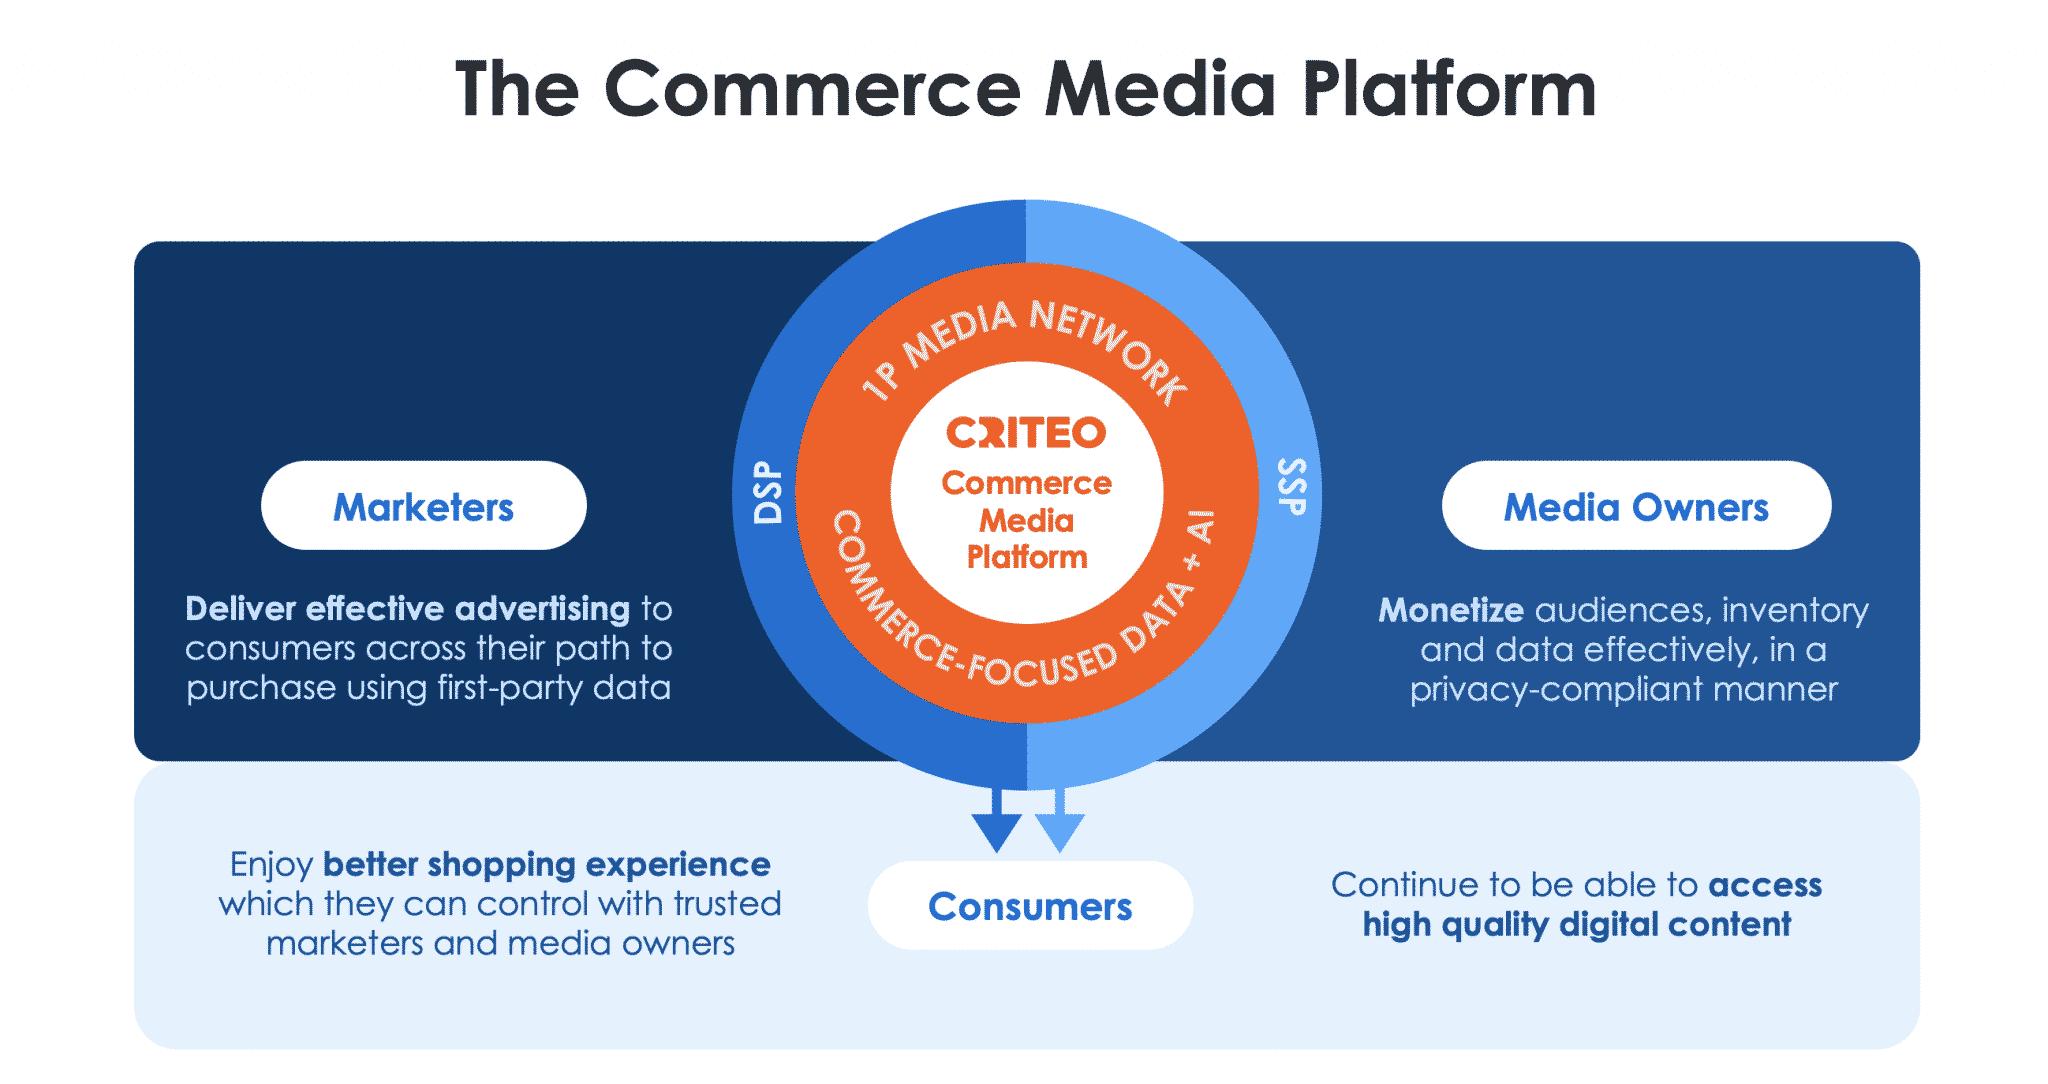 Criteo Commerce Media Platform